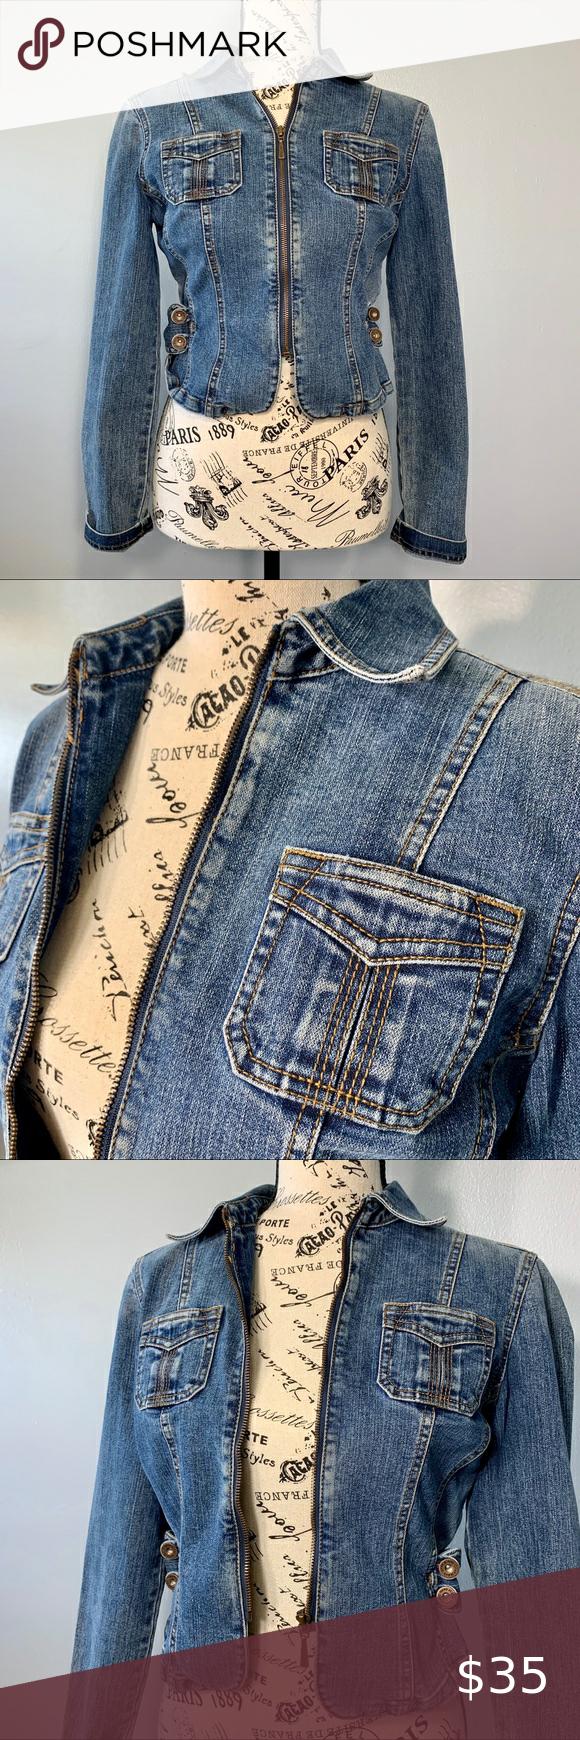 Dkny Denim Jacket Dkny Denim Jacket Super Cute Cropped Jean Jacket With Pockets And Zipper Approx Measurements 13 Bu Denim Jacket Jackets Cute Jean Jackets [ 1740 x 580 Pixel ]